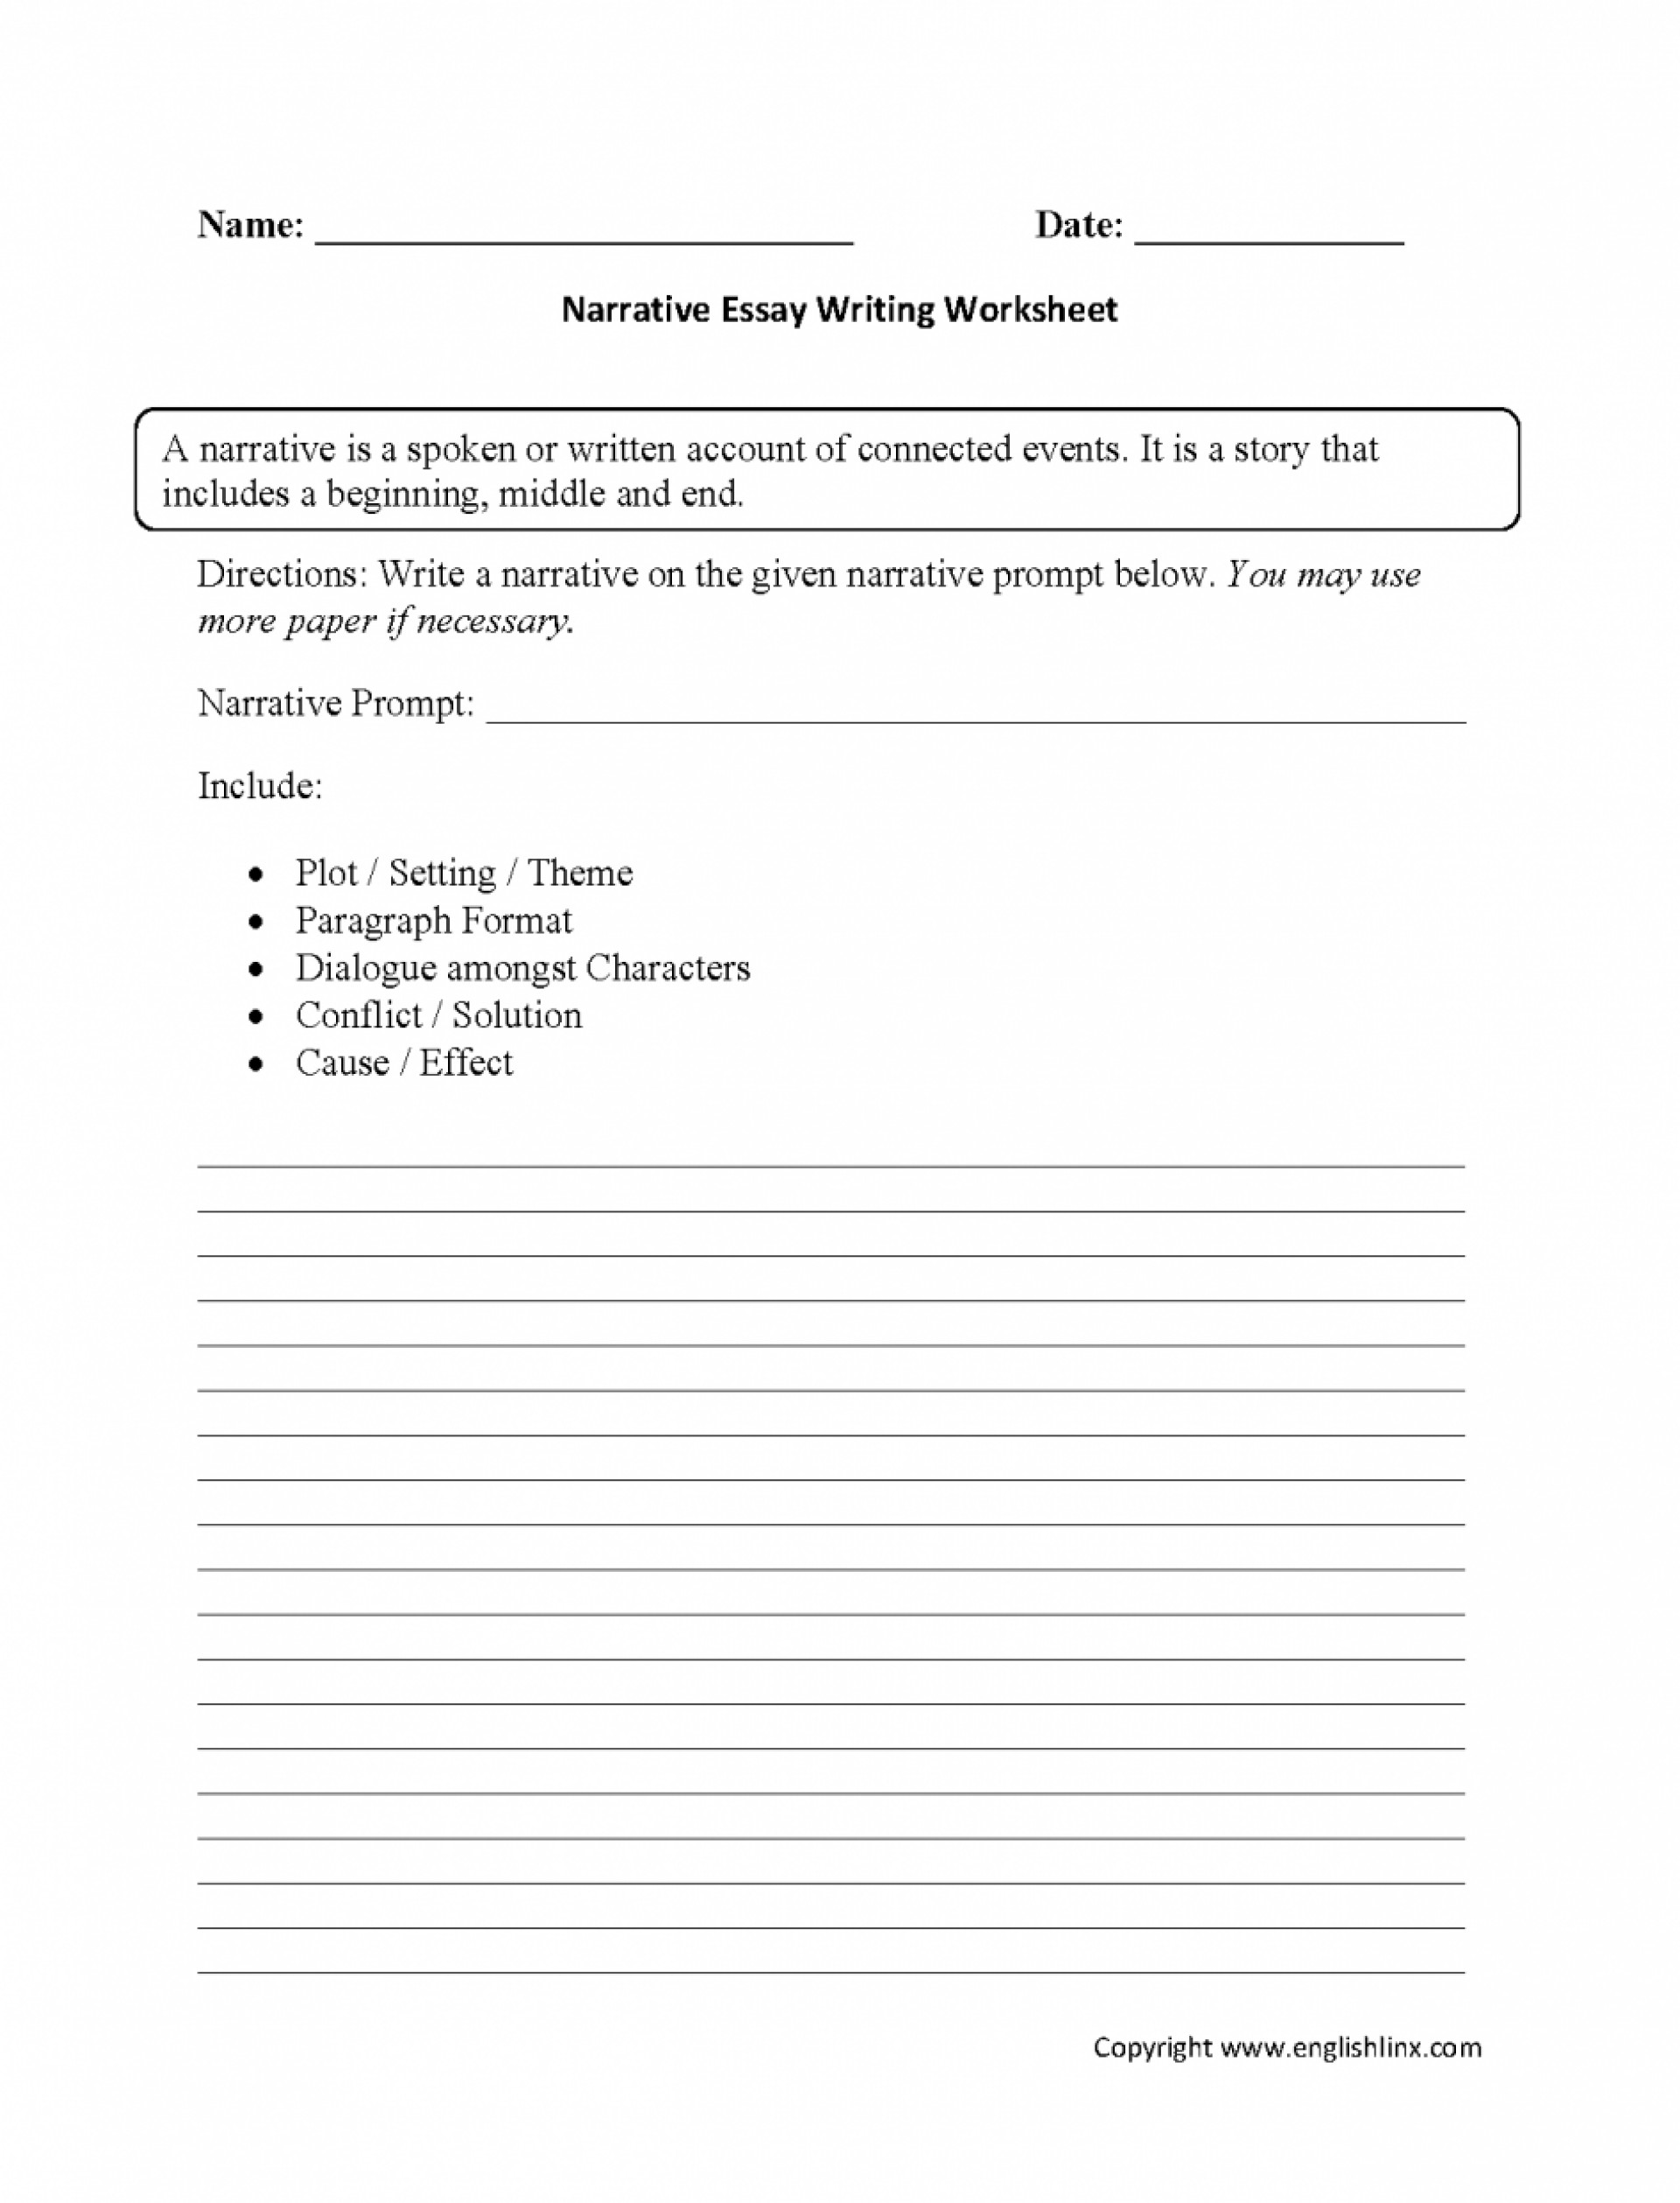 001 Essay Example 3rd Grade Paragraph Writing Worksheets Download Free Third Printa Worksheet Narrative Online Sensational Grader For Teachers Paper Students 1920